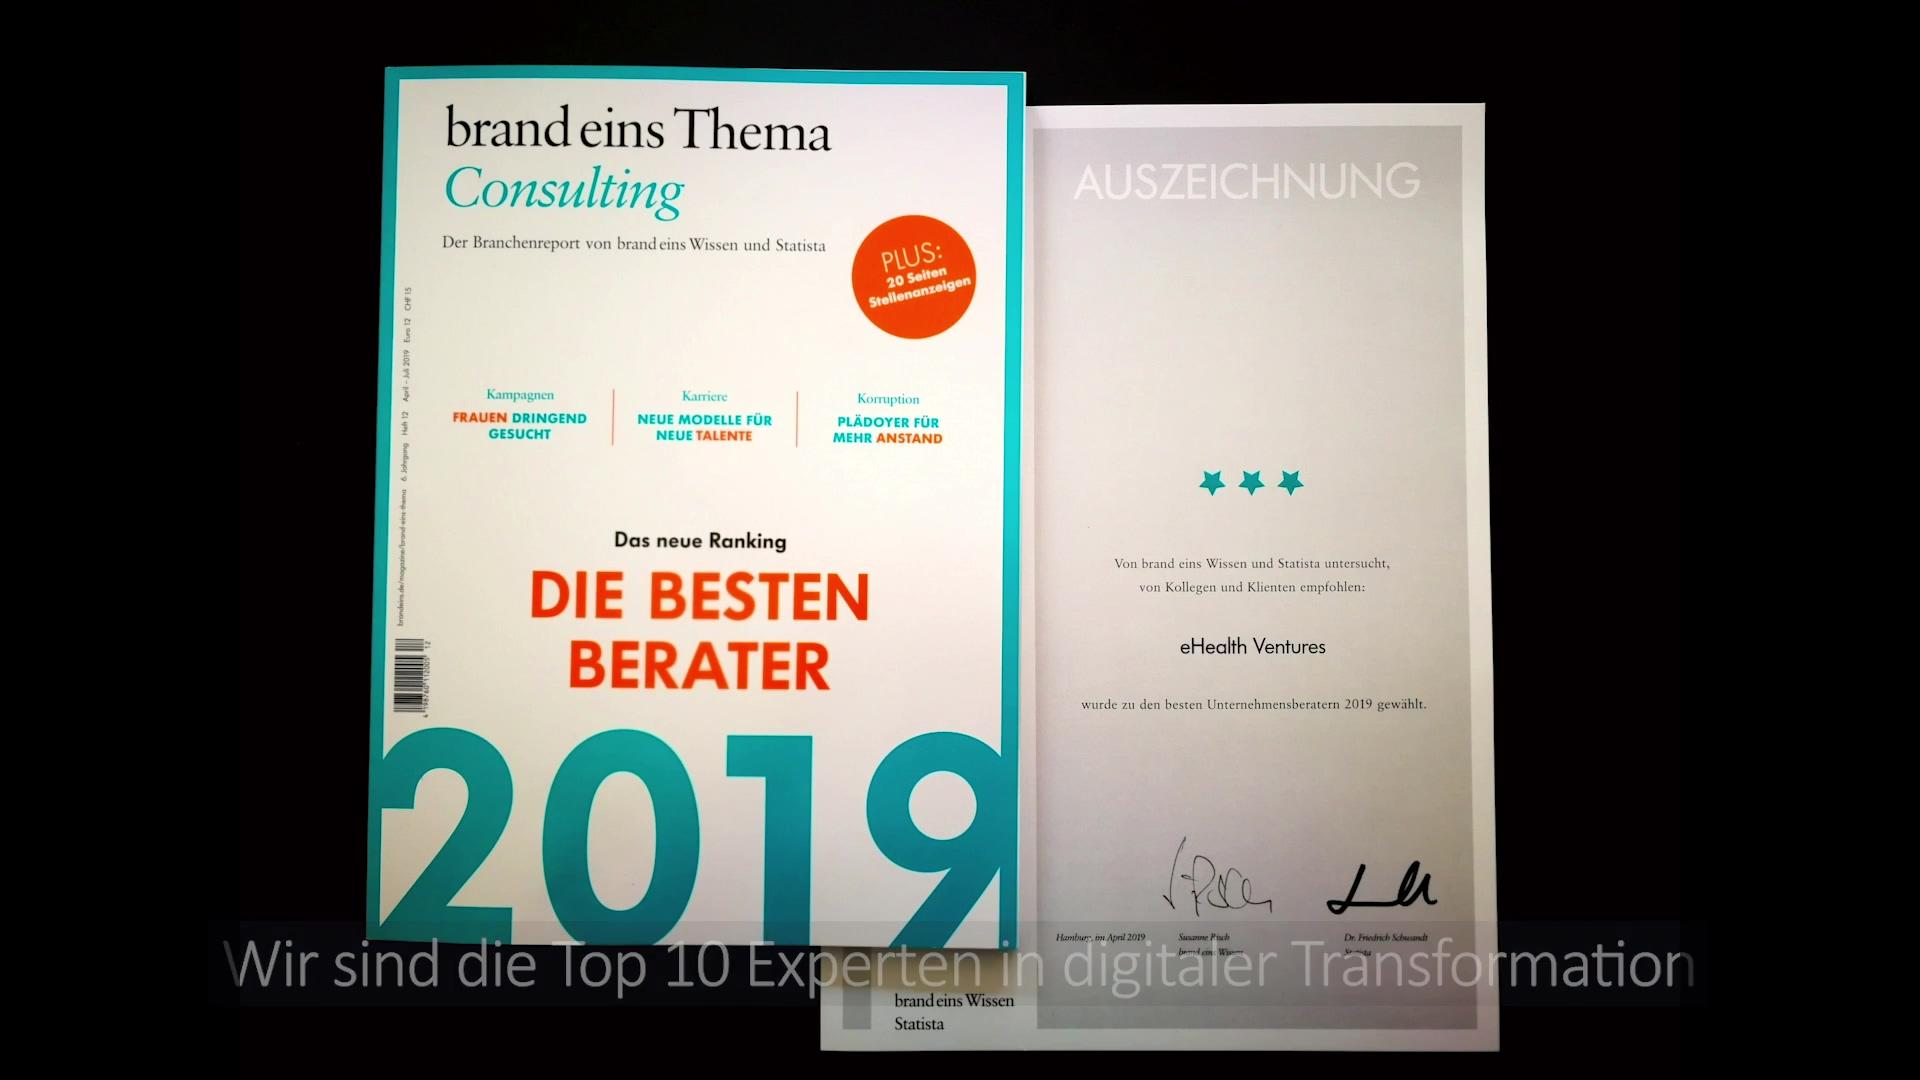 BesteBerater2019